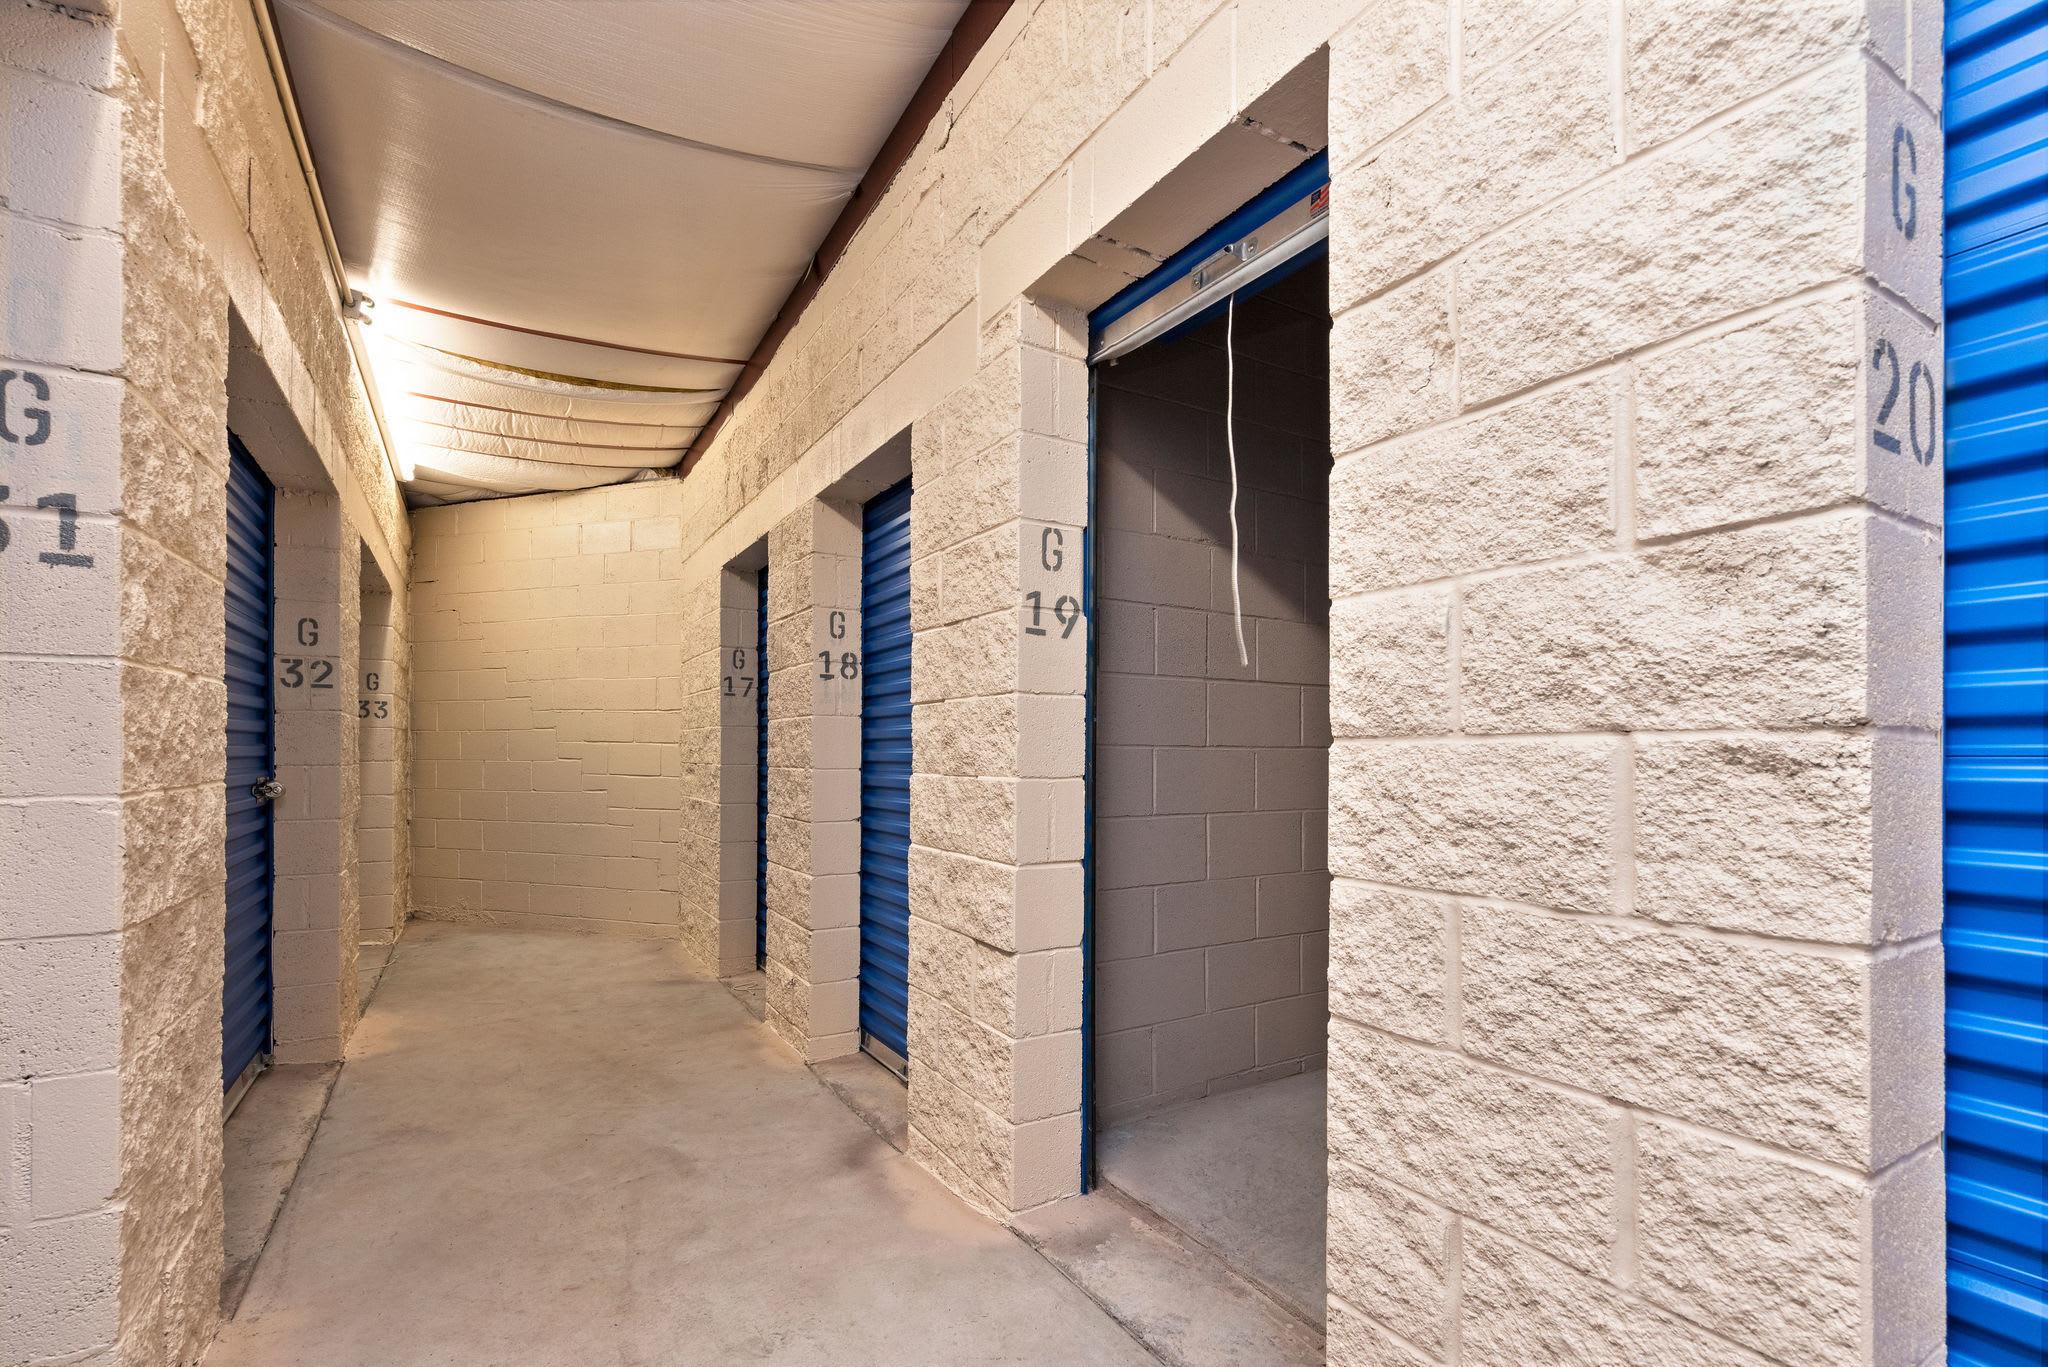 Storage units hallways open at Stor'em Self Storage in Lehi, Utah